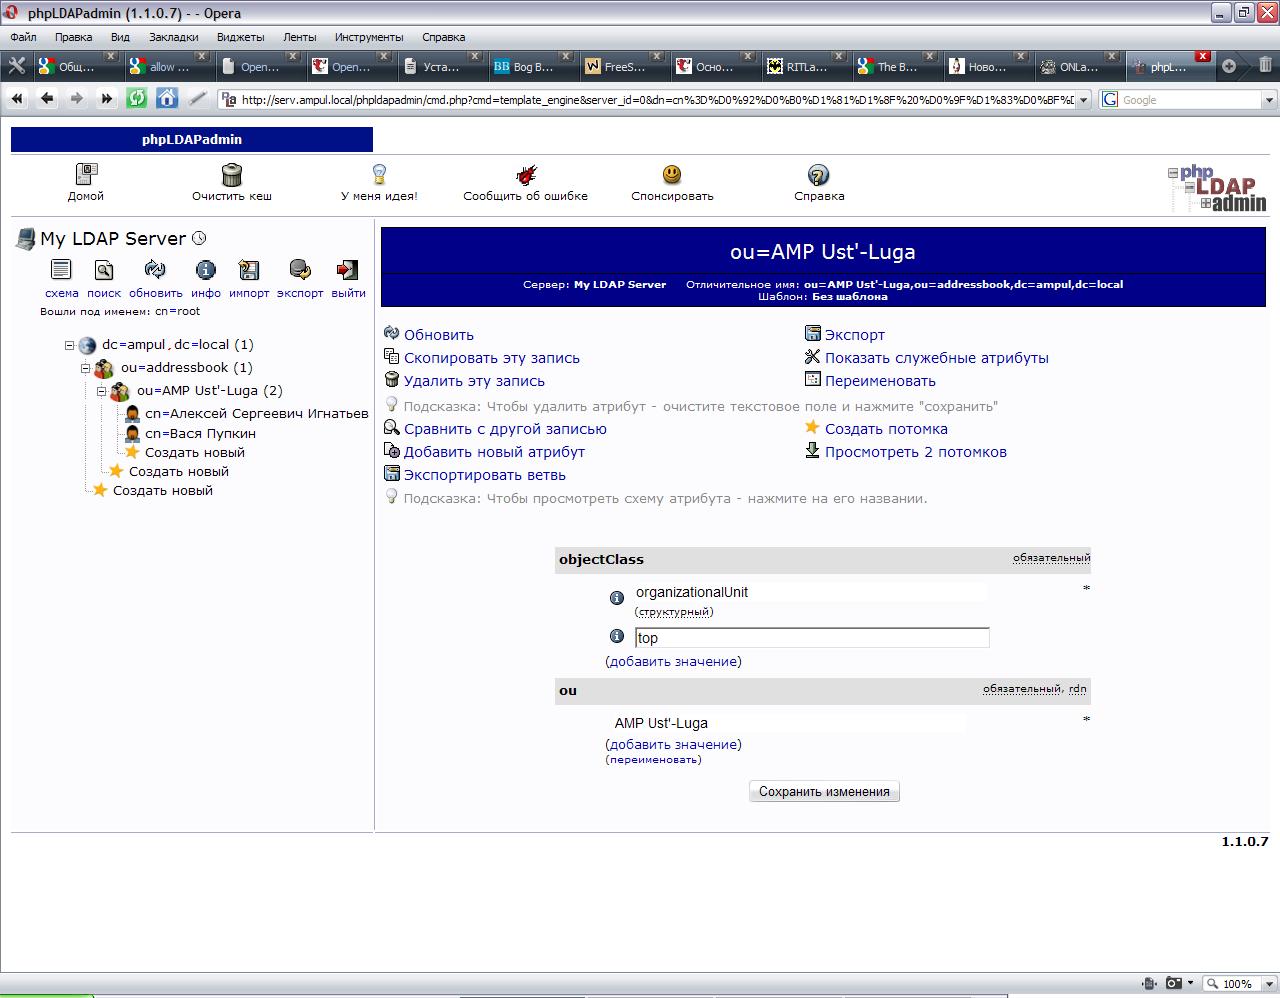 Ldap windows server 2012 r2